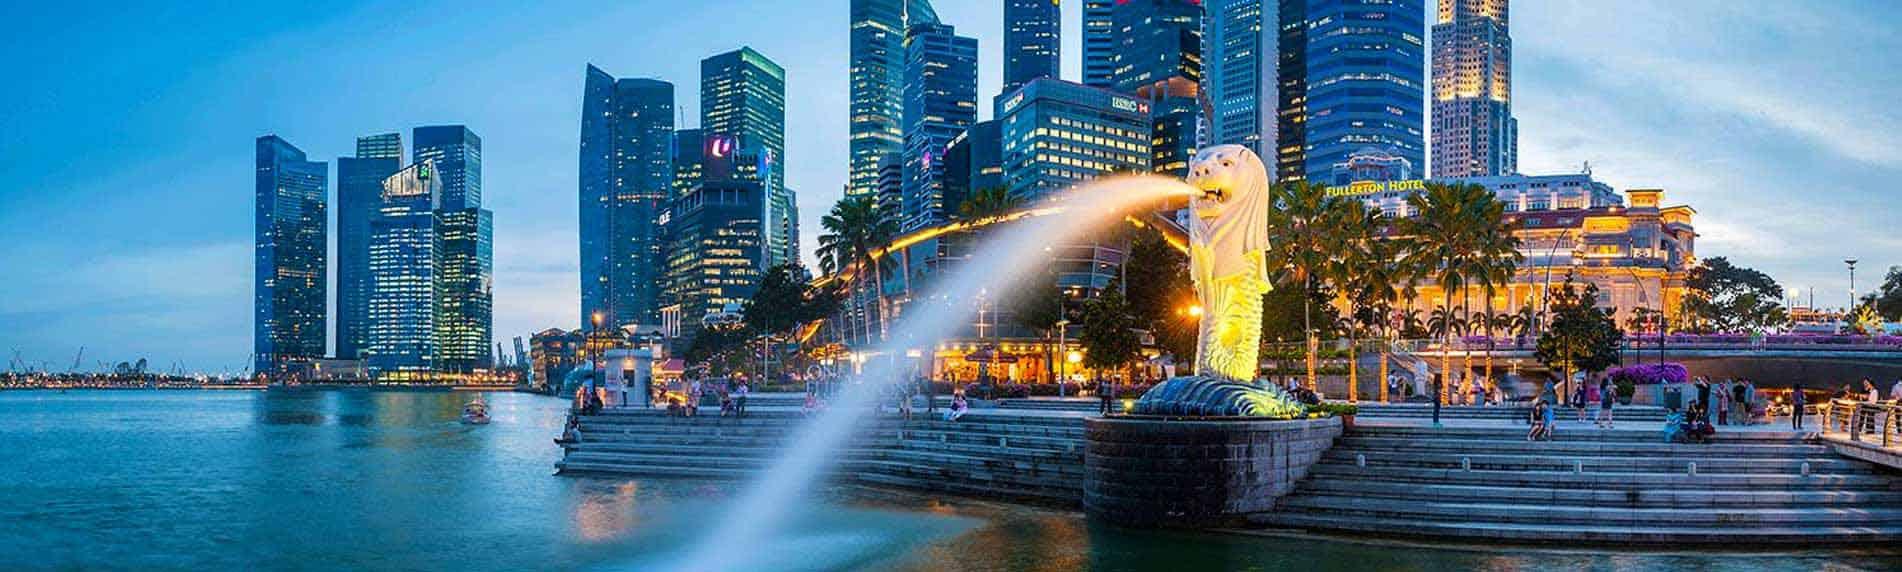 Splendors of Singapore 5 nights